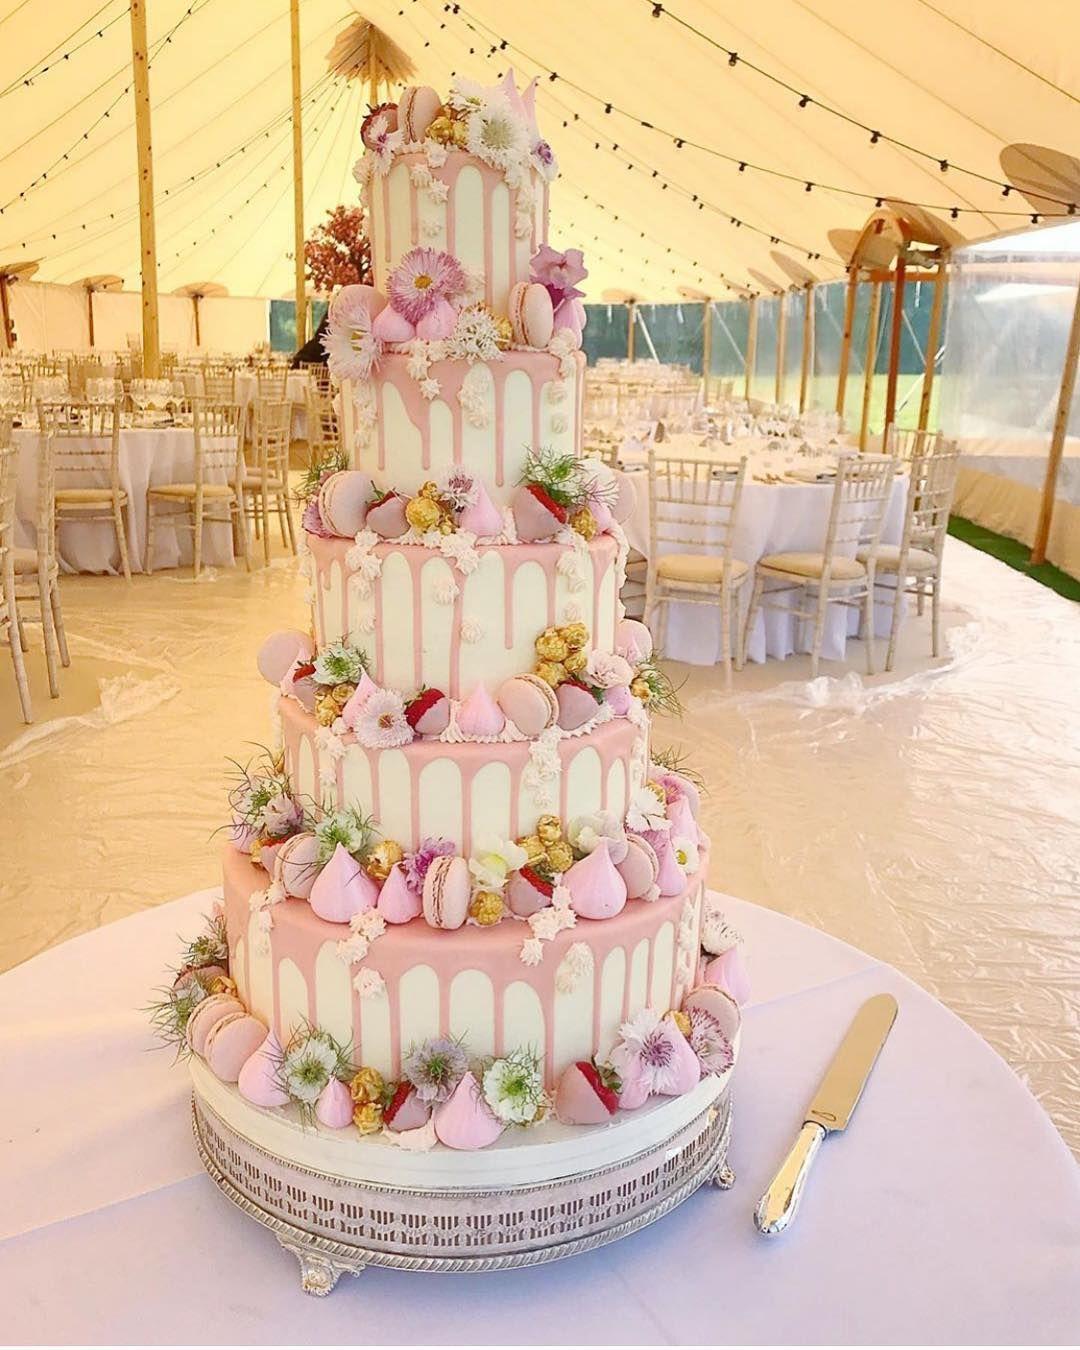 M E R I N G U E G I R L S On Instagram A Fondantfox X Meringuegirls Wedding Wedding Cake Flavors Wedding Cake Prices 5 Tier Wedding Cakes